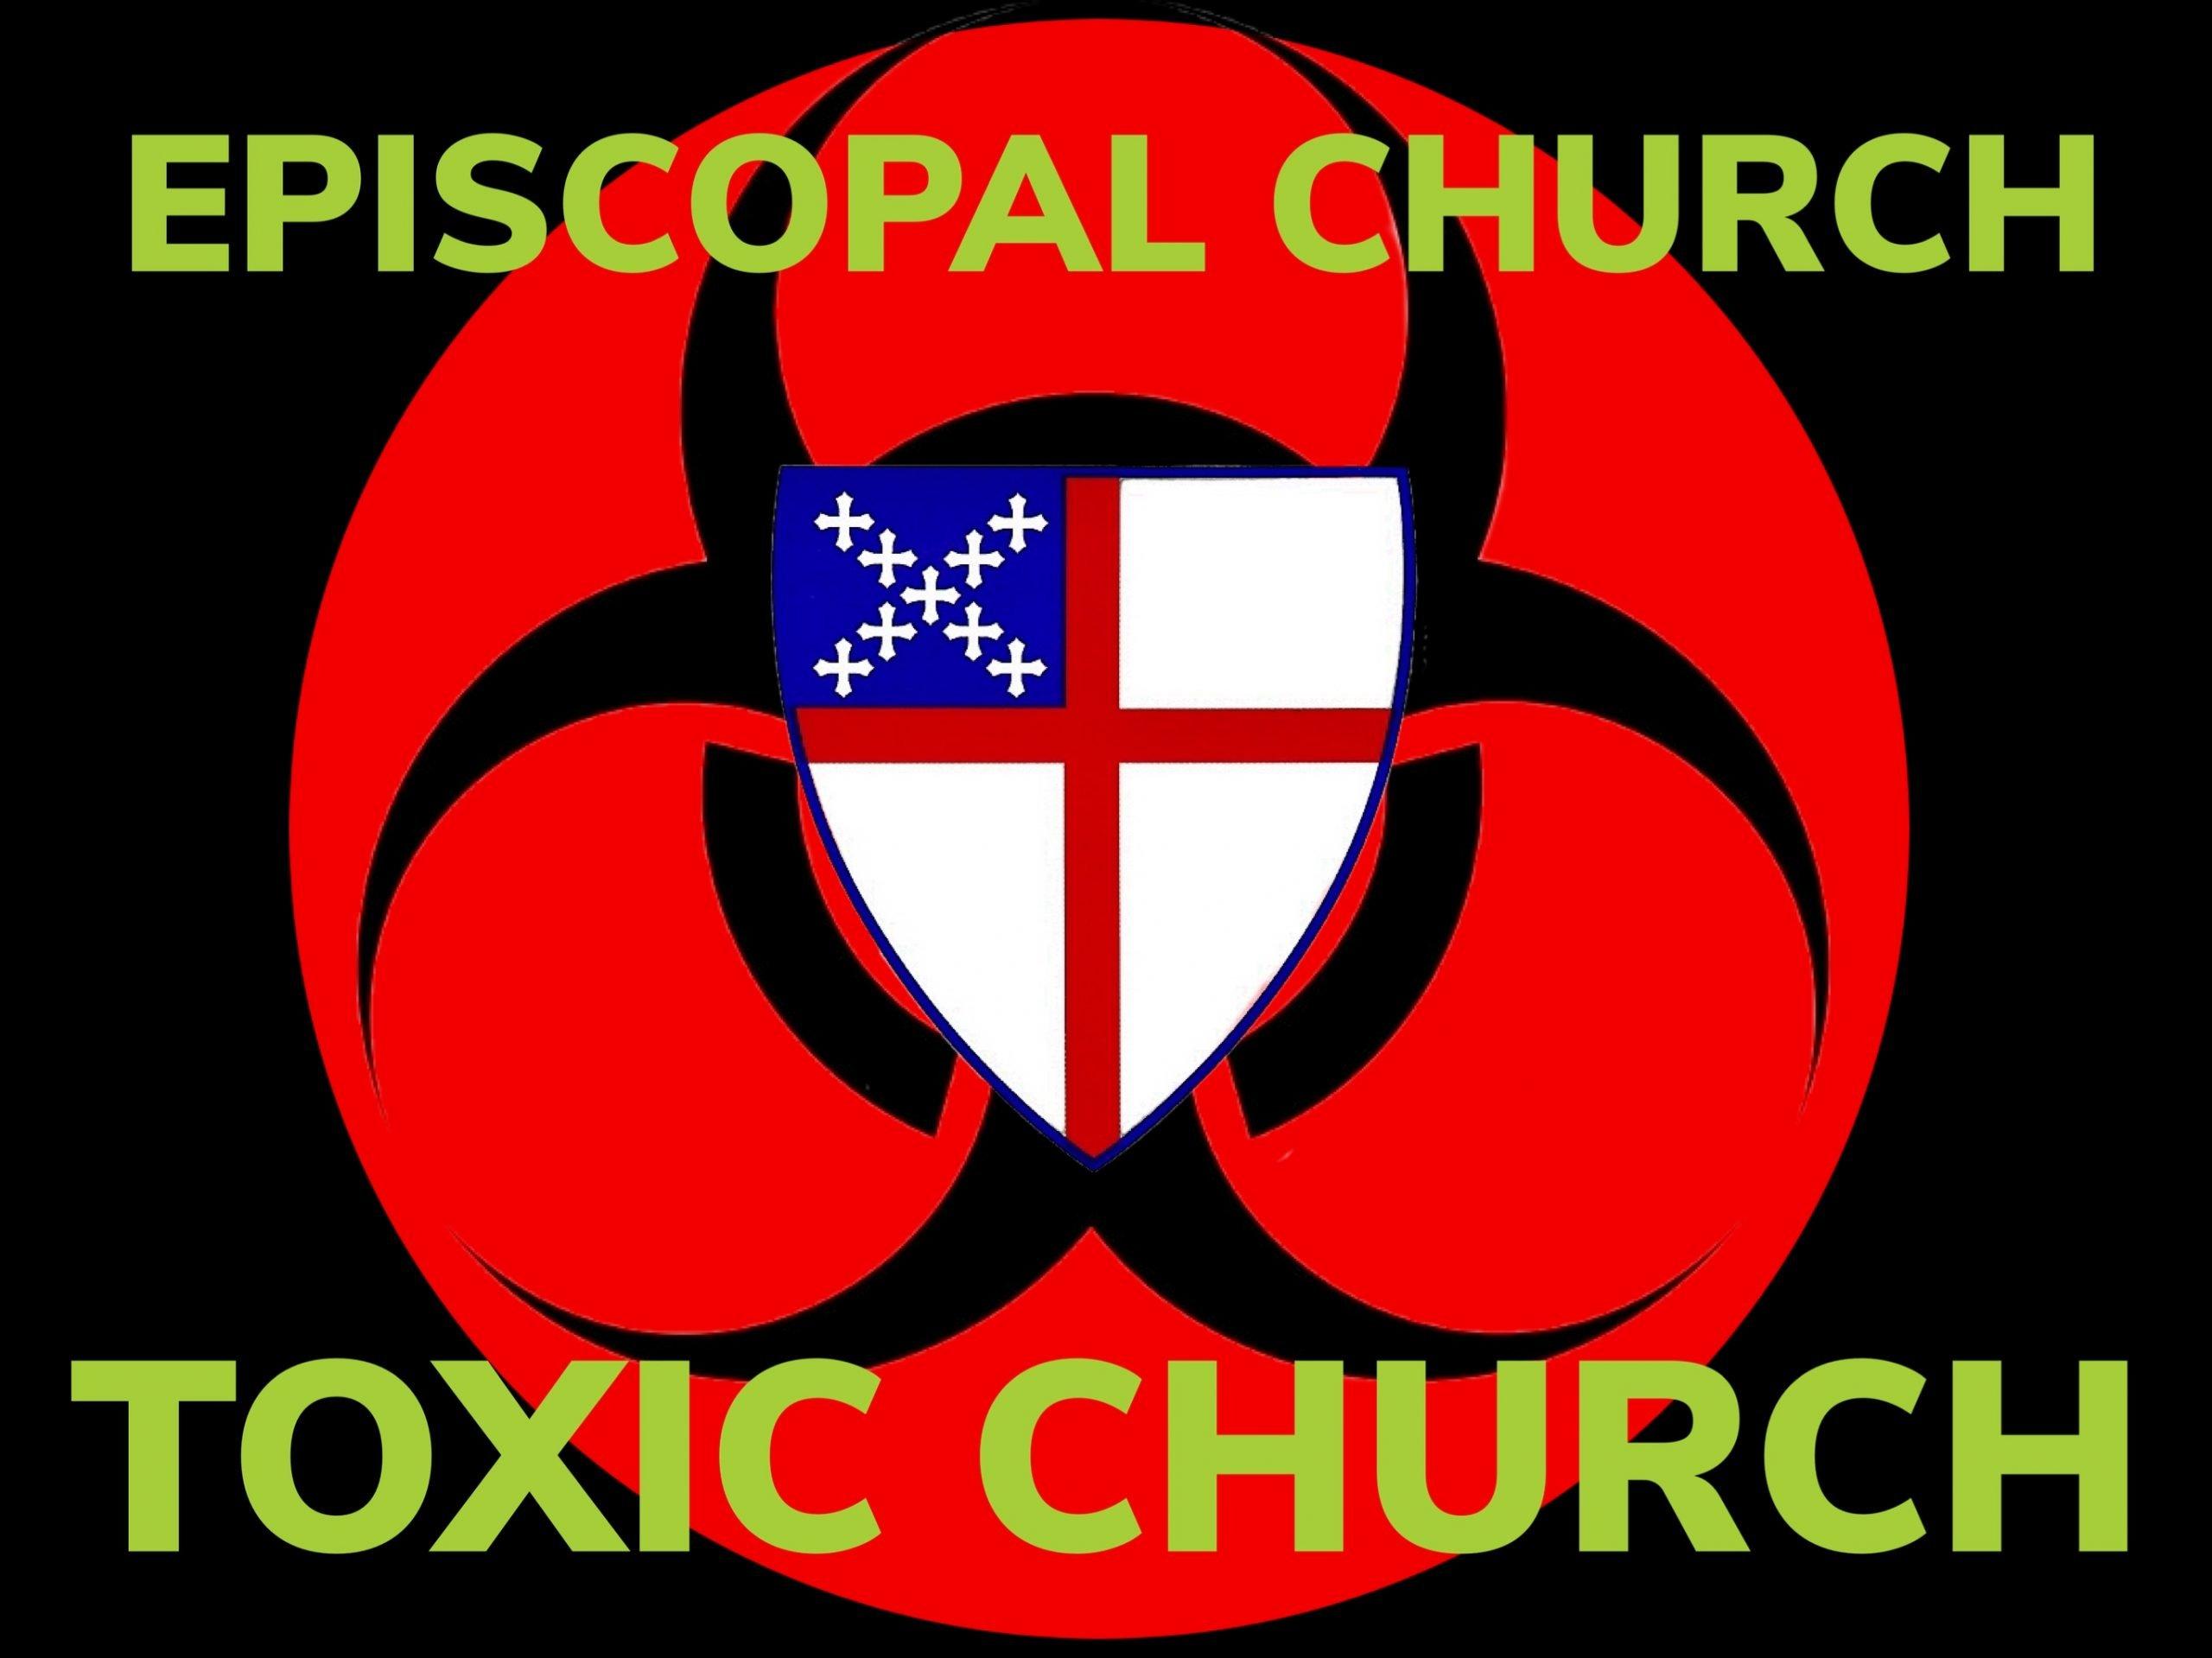 Episcopal Church, Toxic Church